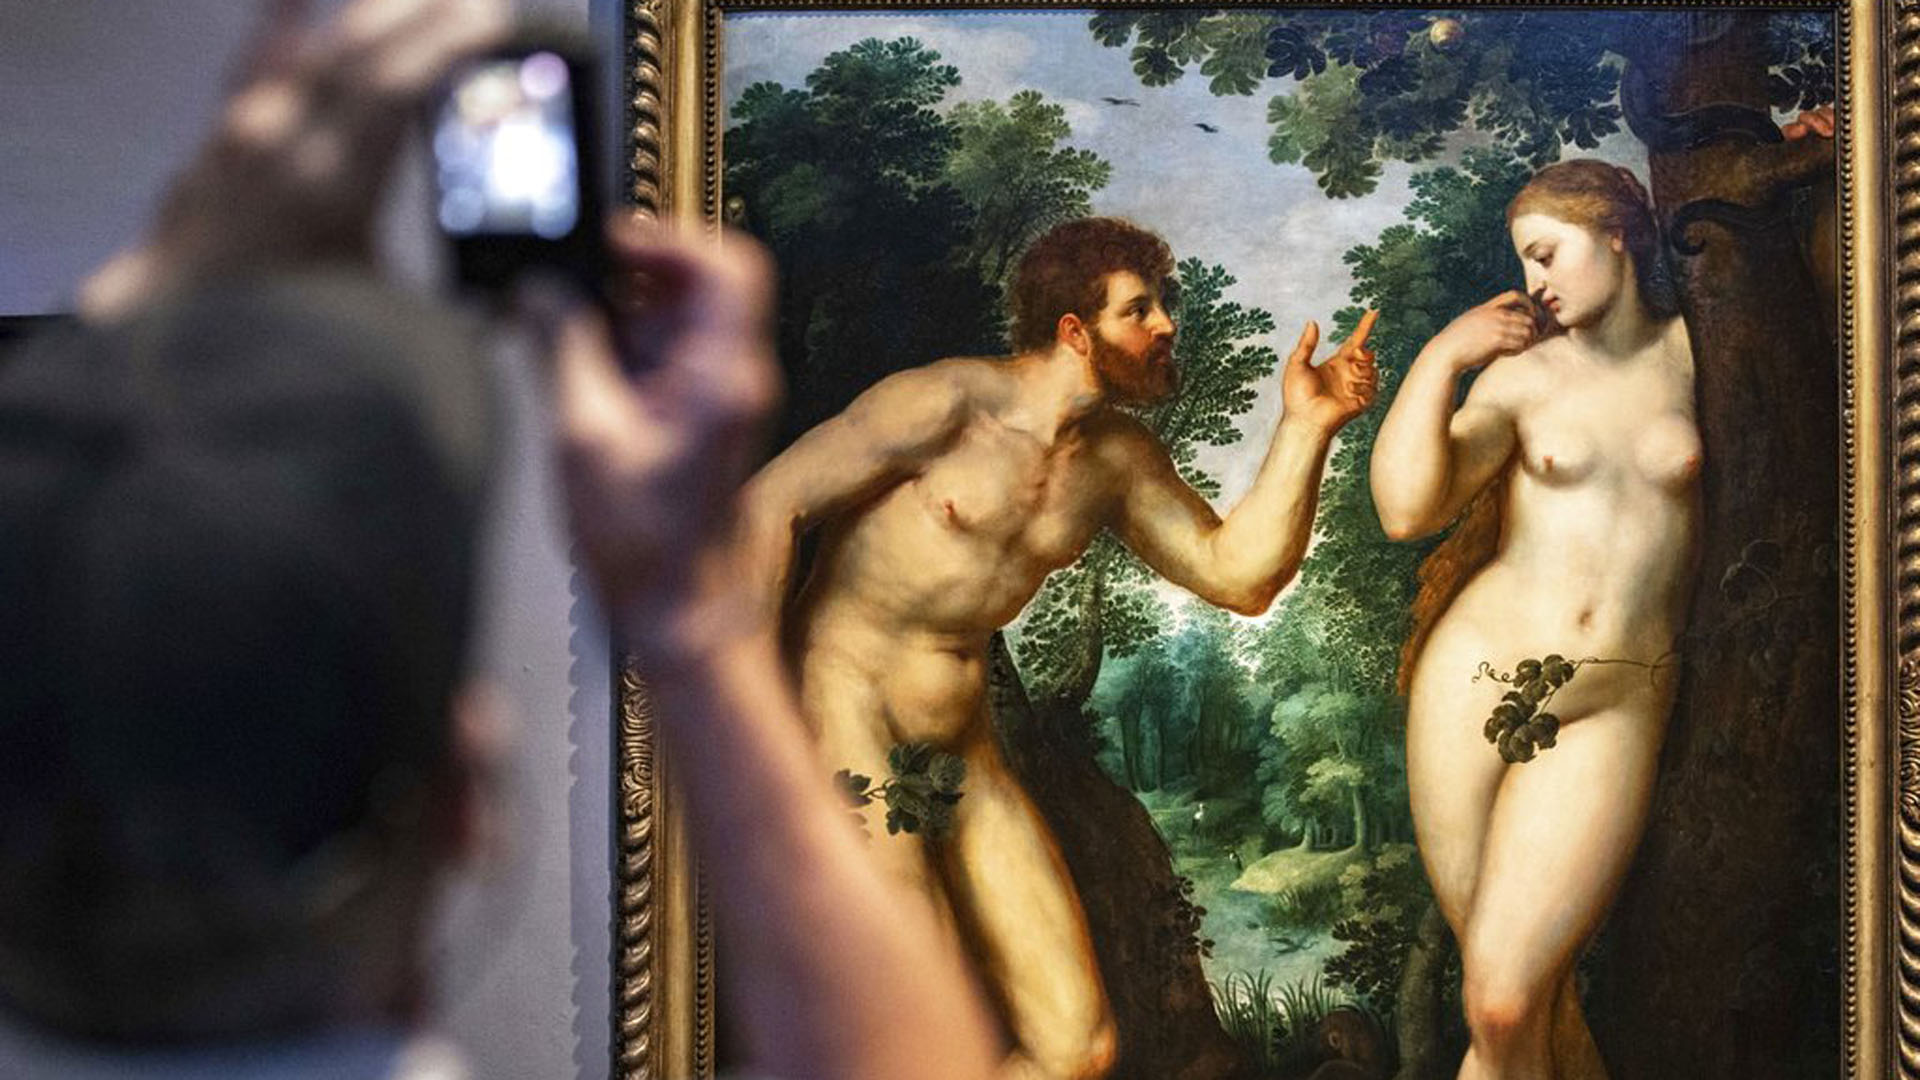 Belgium Art Nudity_1532821019199